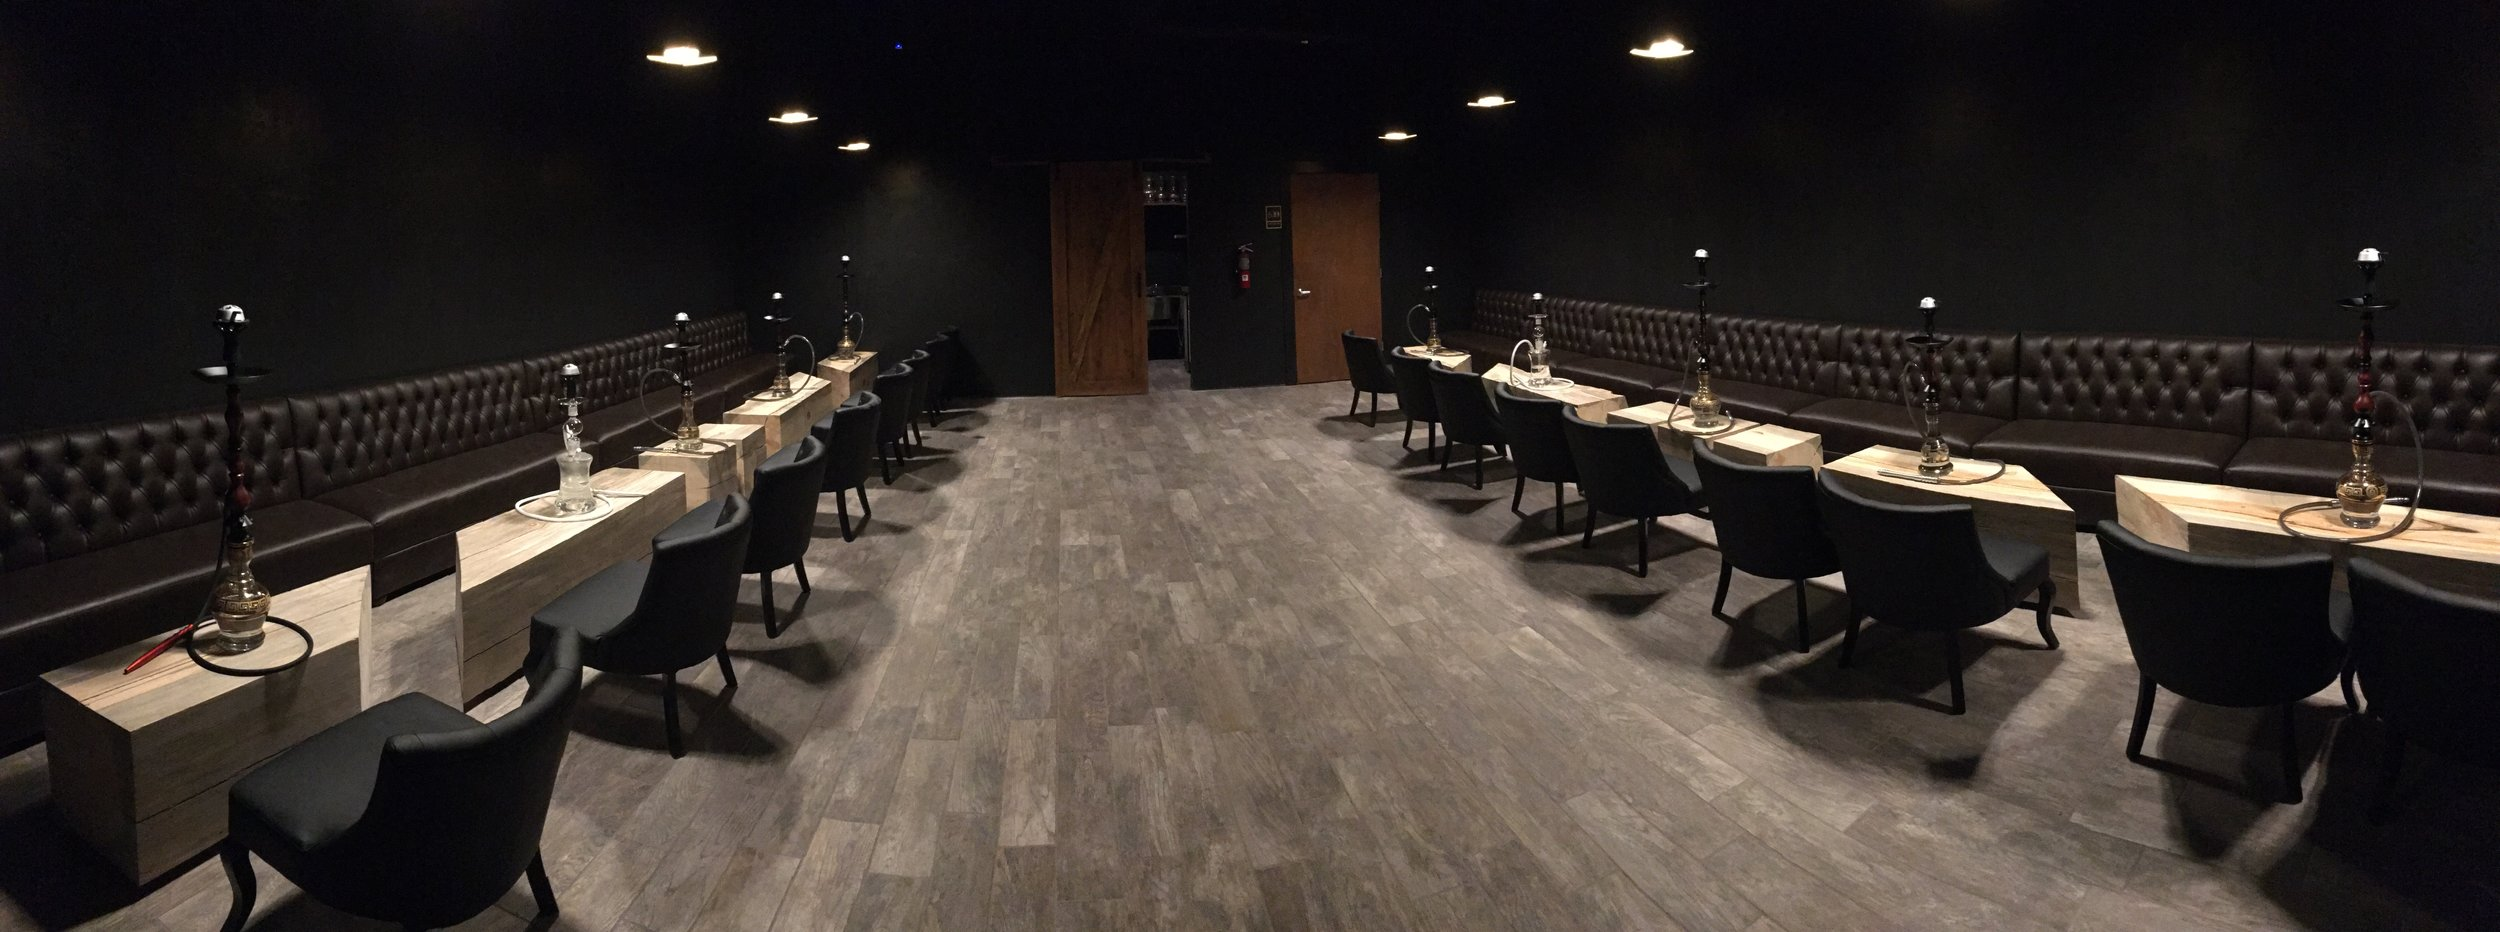 The Lounge Floor